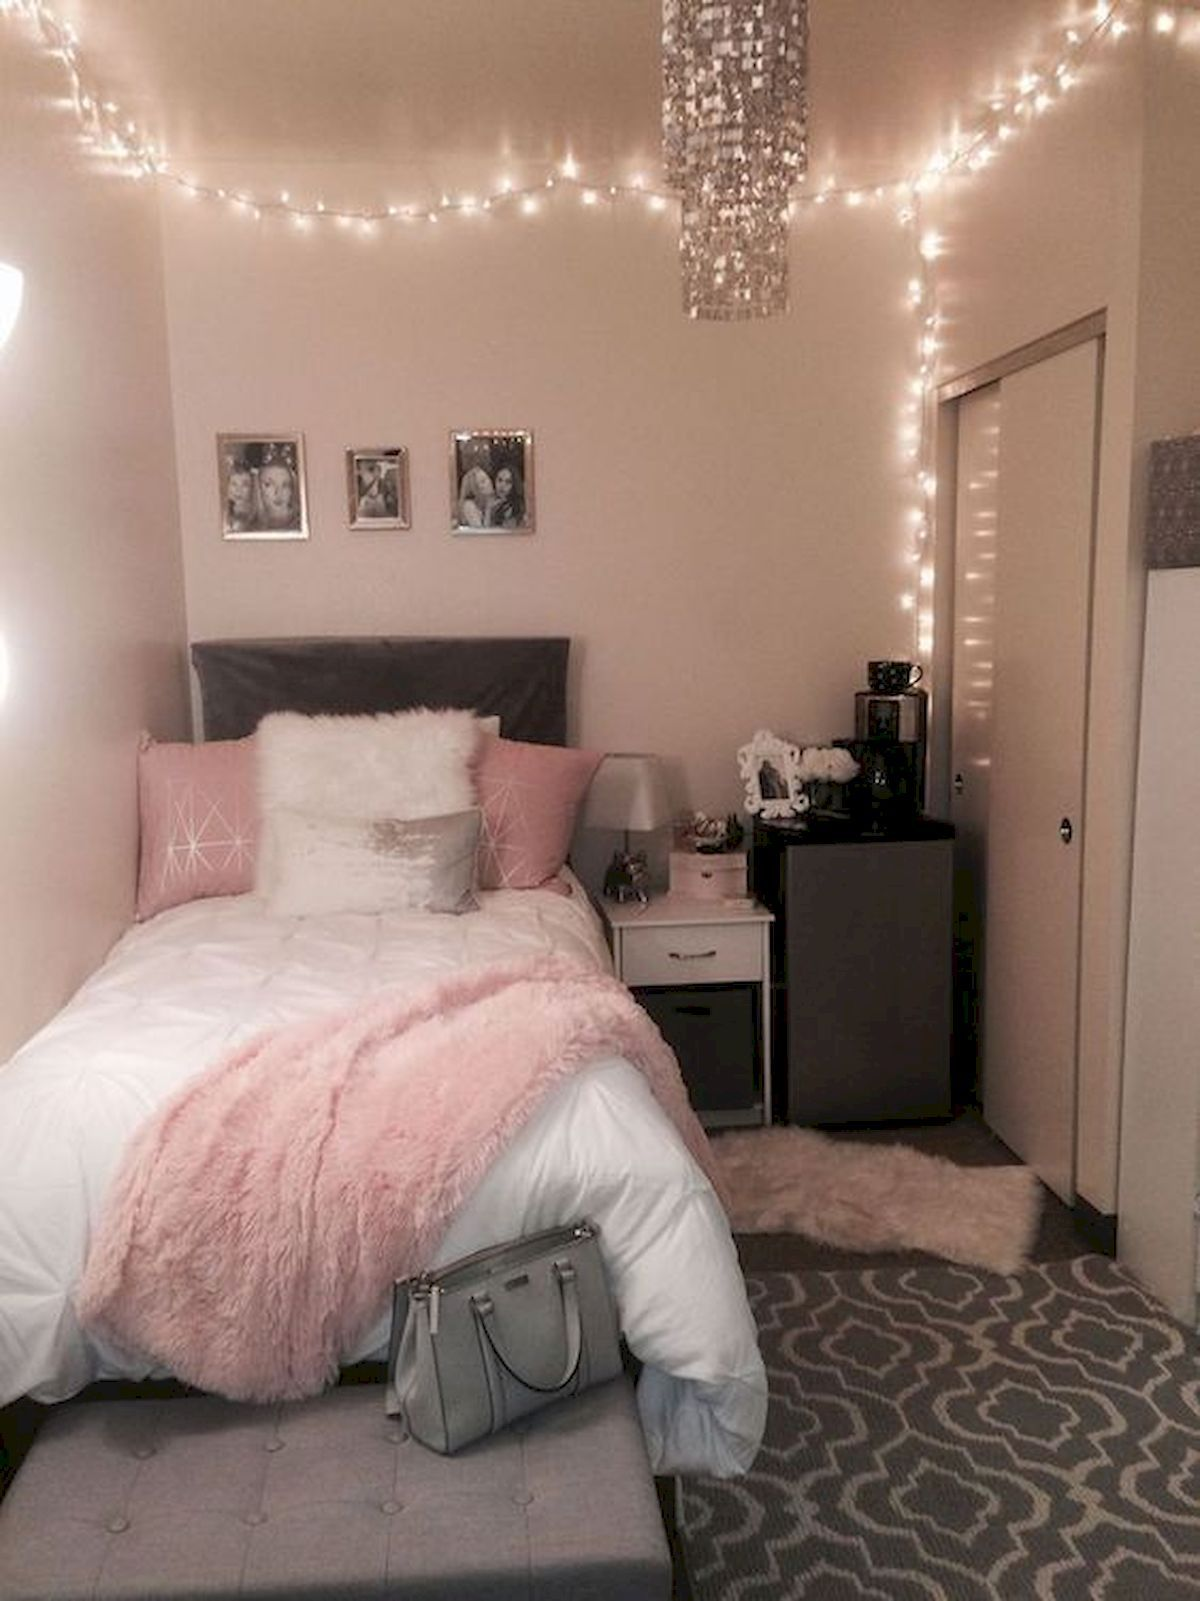 40 Cute Small Bedroom Design And Decor Ideas For Teenage Girl Small Room Bedroom Dorm Room Inspiration Bedroom Decor